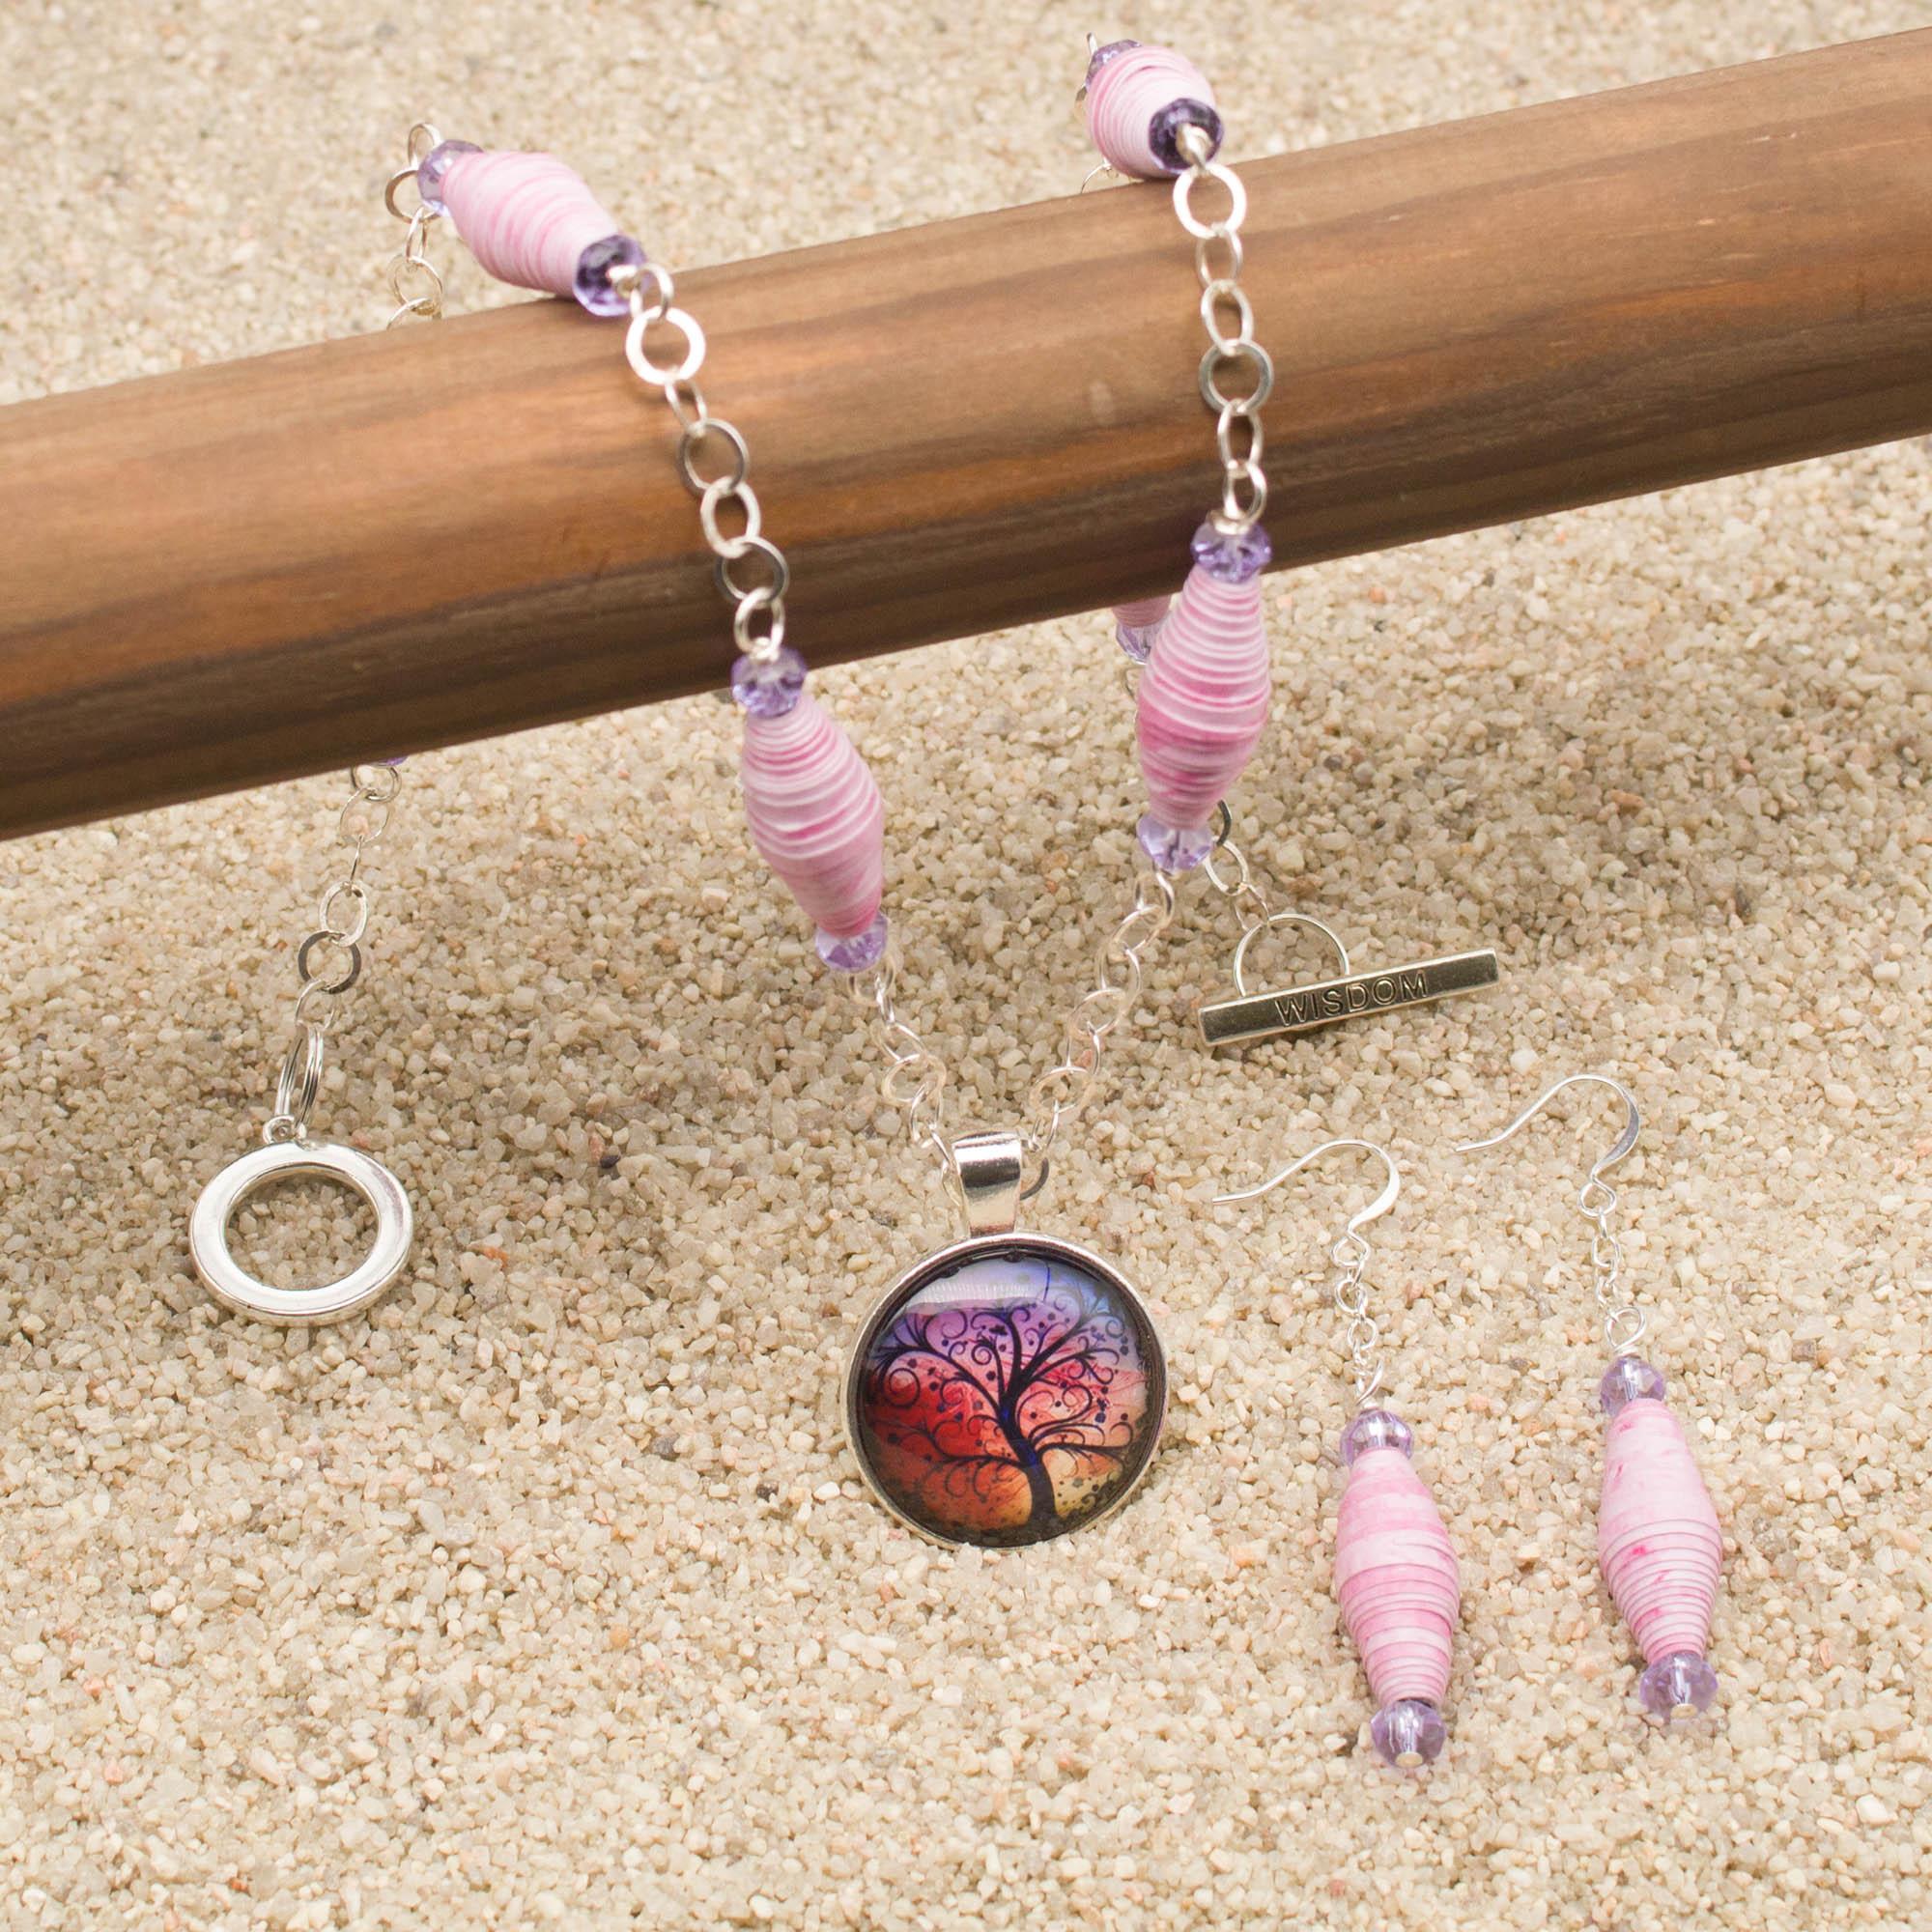 NE811LSb - Windswept Necklace and Earring Set